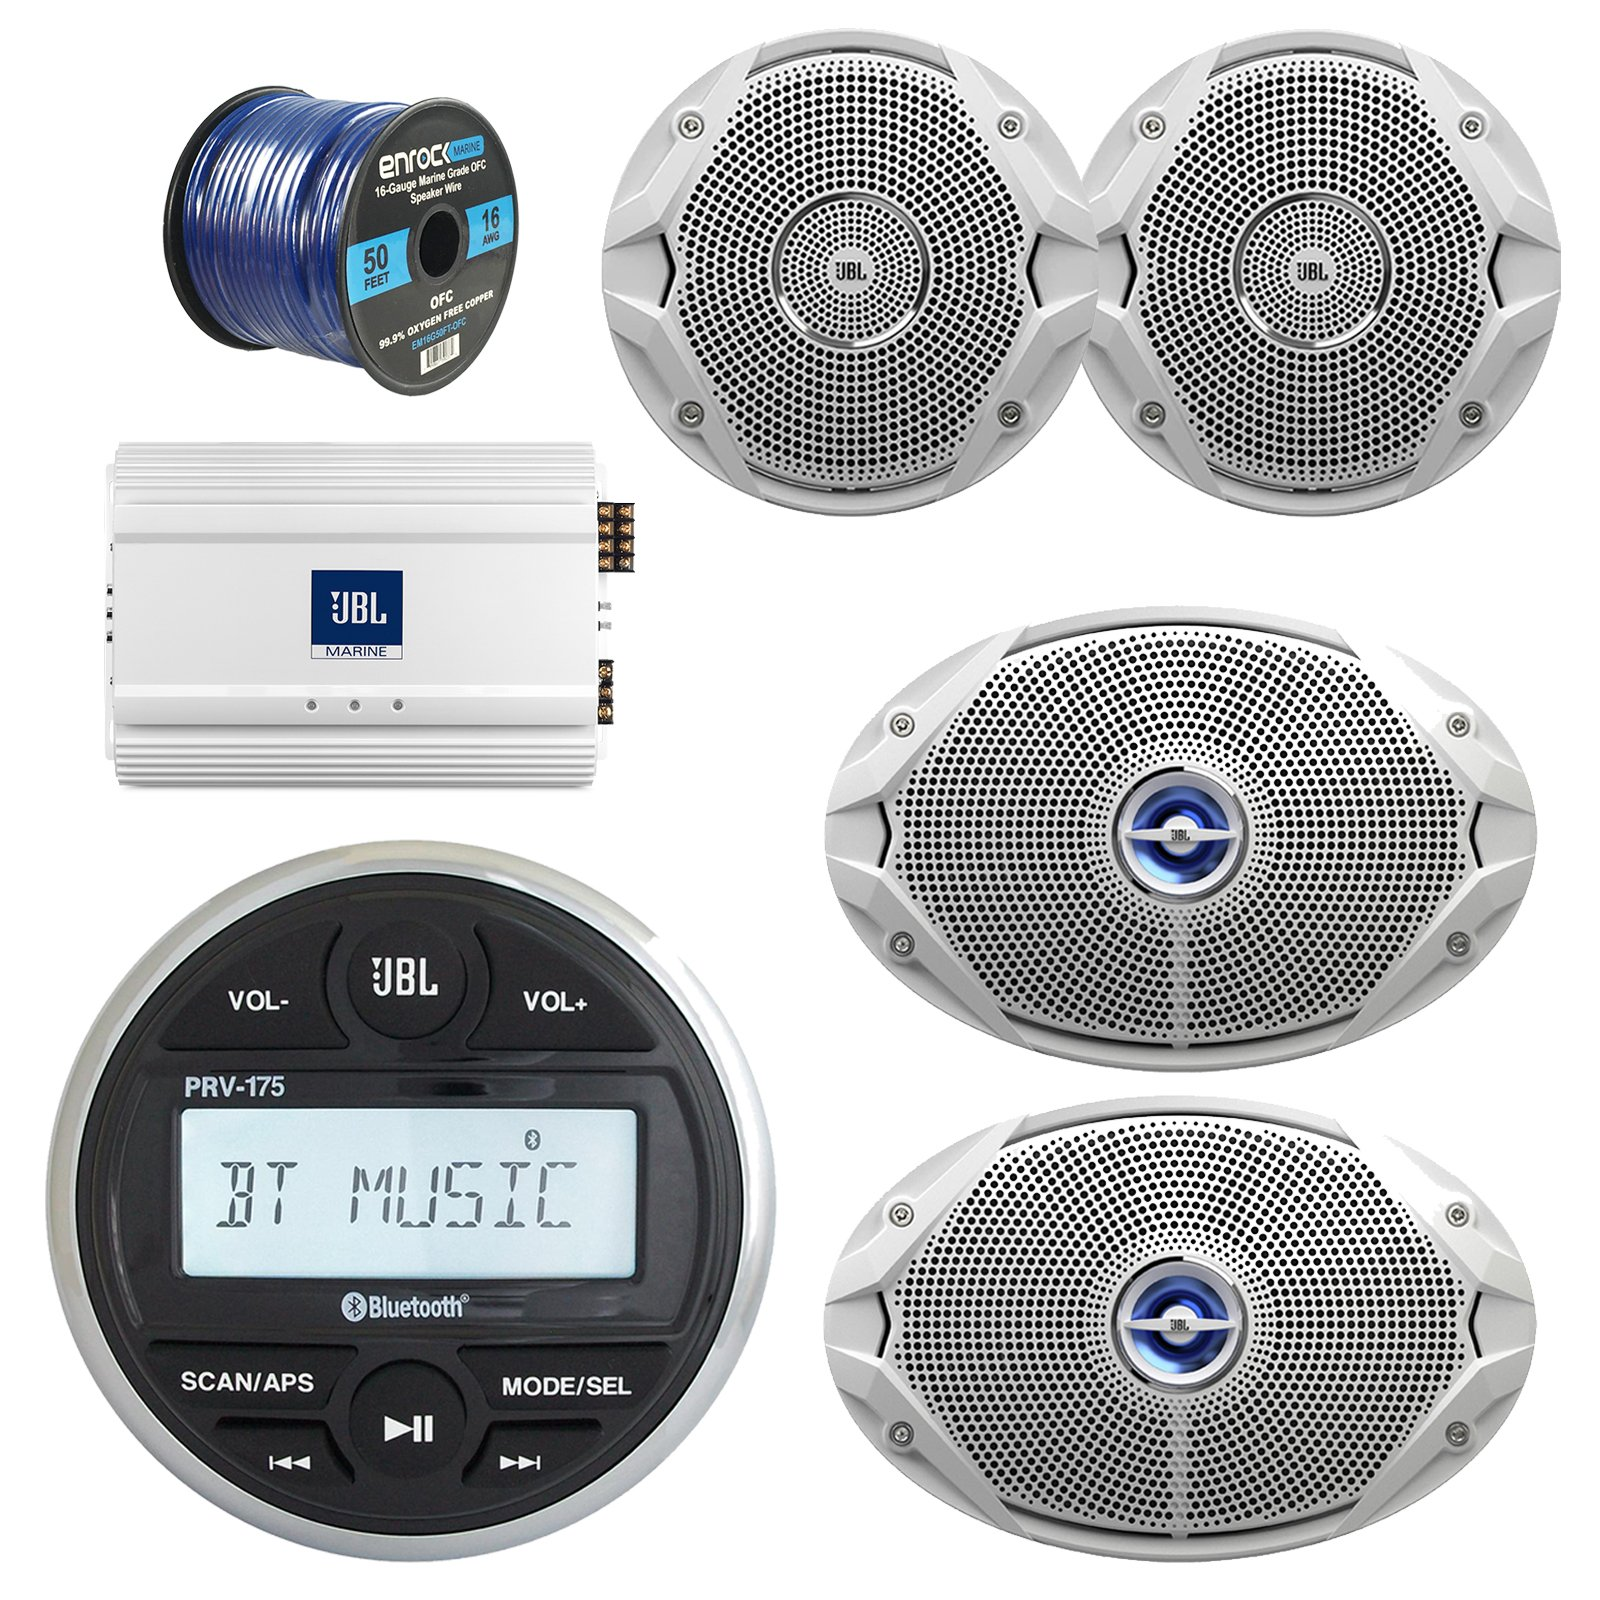 JBL Gauge Style Marine Digital Media Bluetooth Receiver, JBL 4-Channel Full-Range Marine Amplifier, 2x JBL 6x9'' 2-Way White Coaxial Speakers + 2x JBL 6.5'' Speakers + Enrock 50 Foot 16g Speaker Wire by JVC